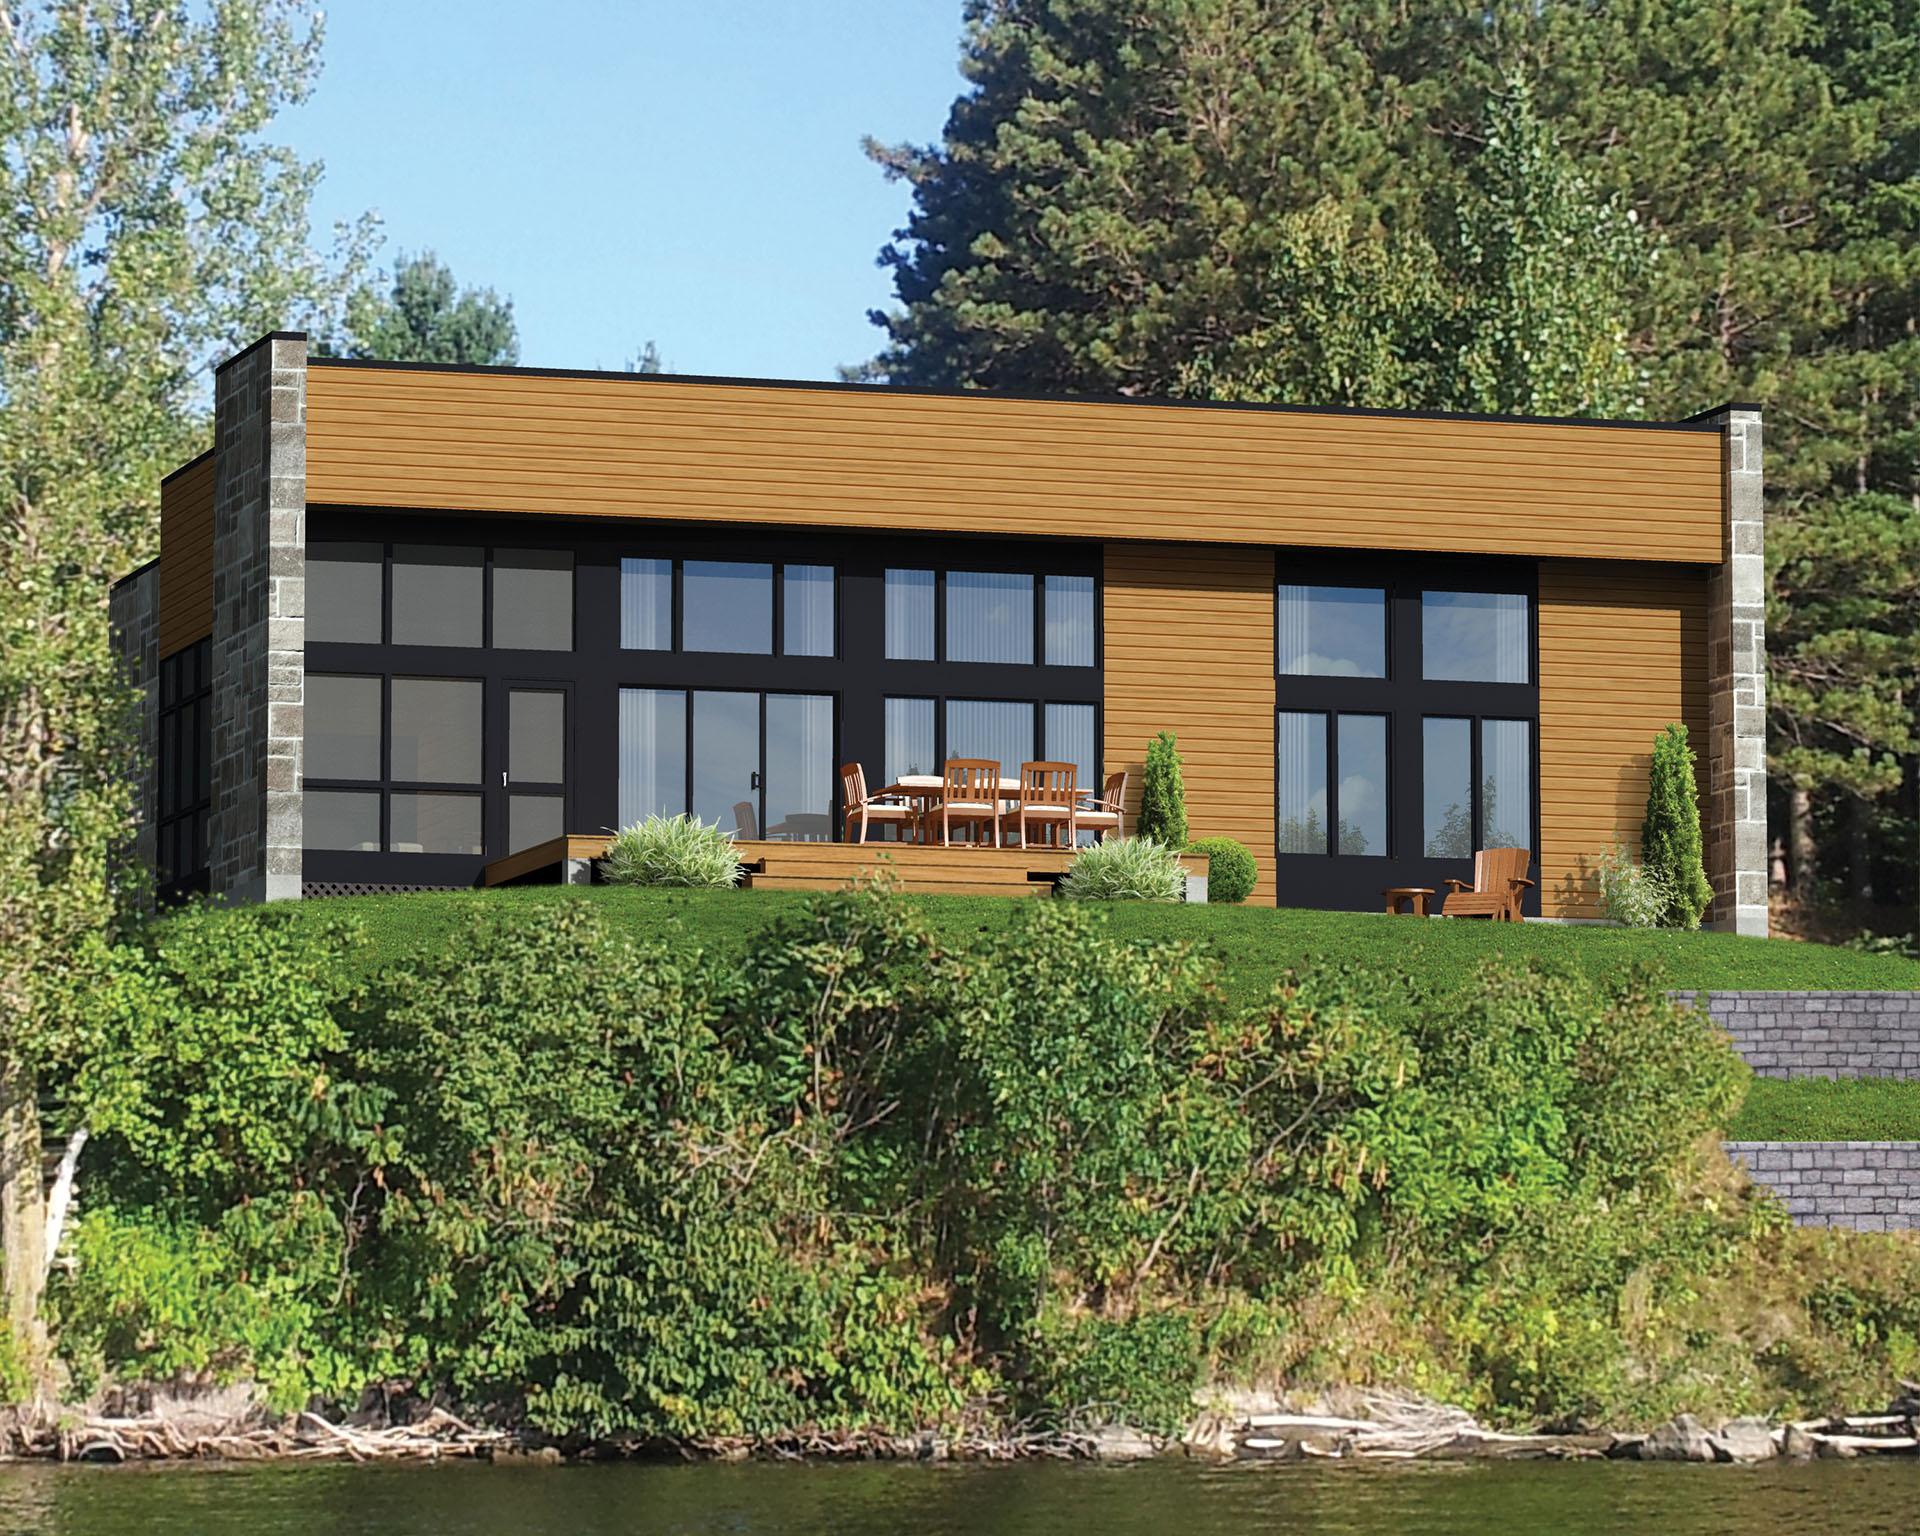 Ranch Style Contemporary - 80811pm Architectural Design